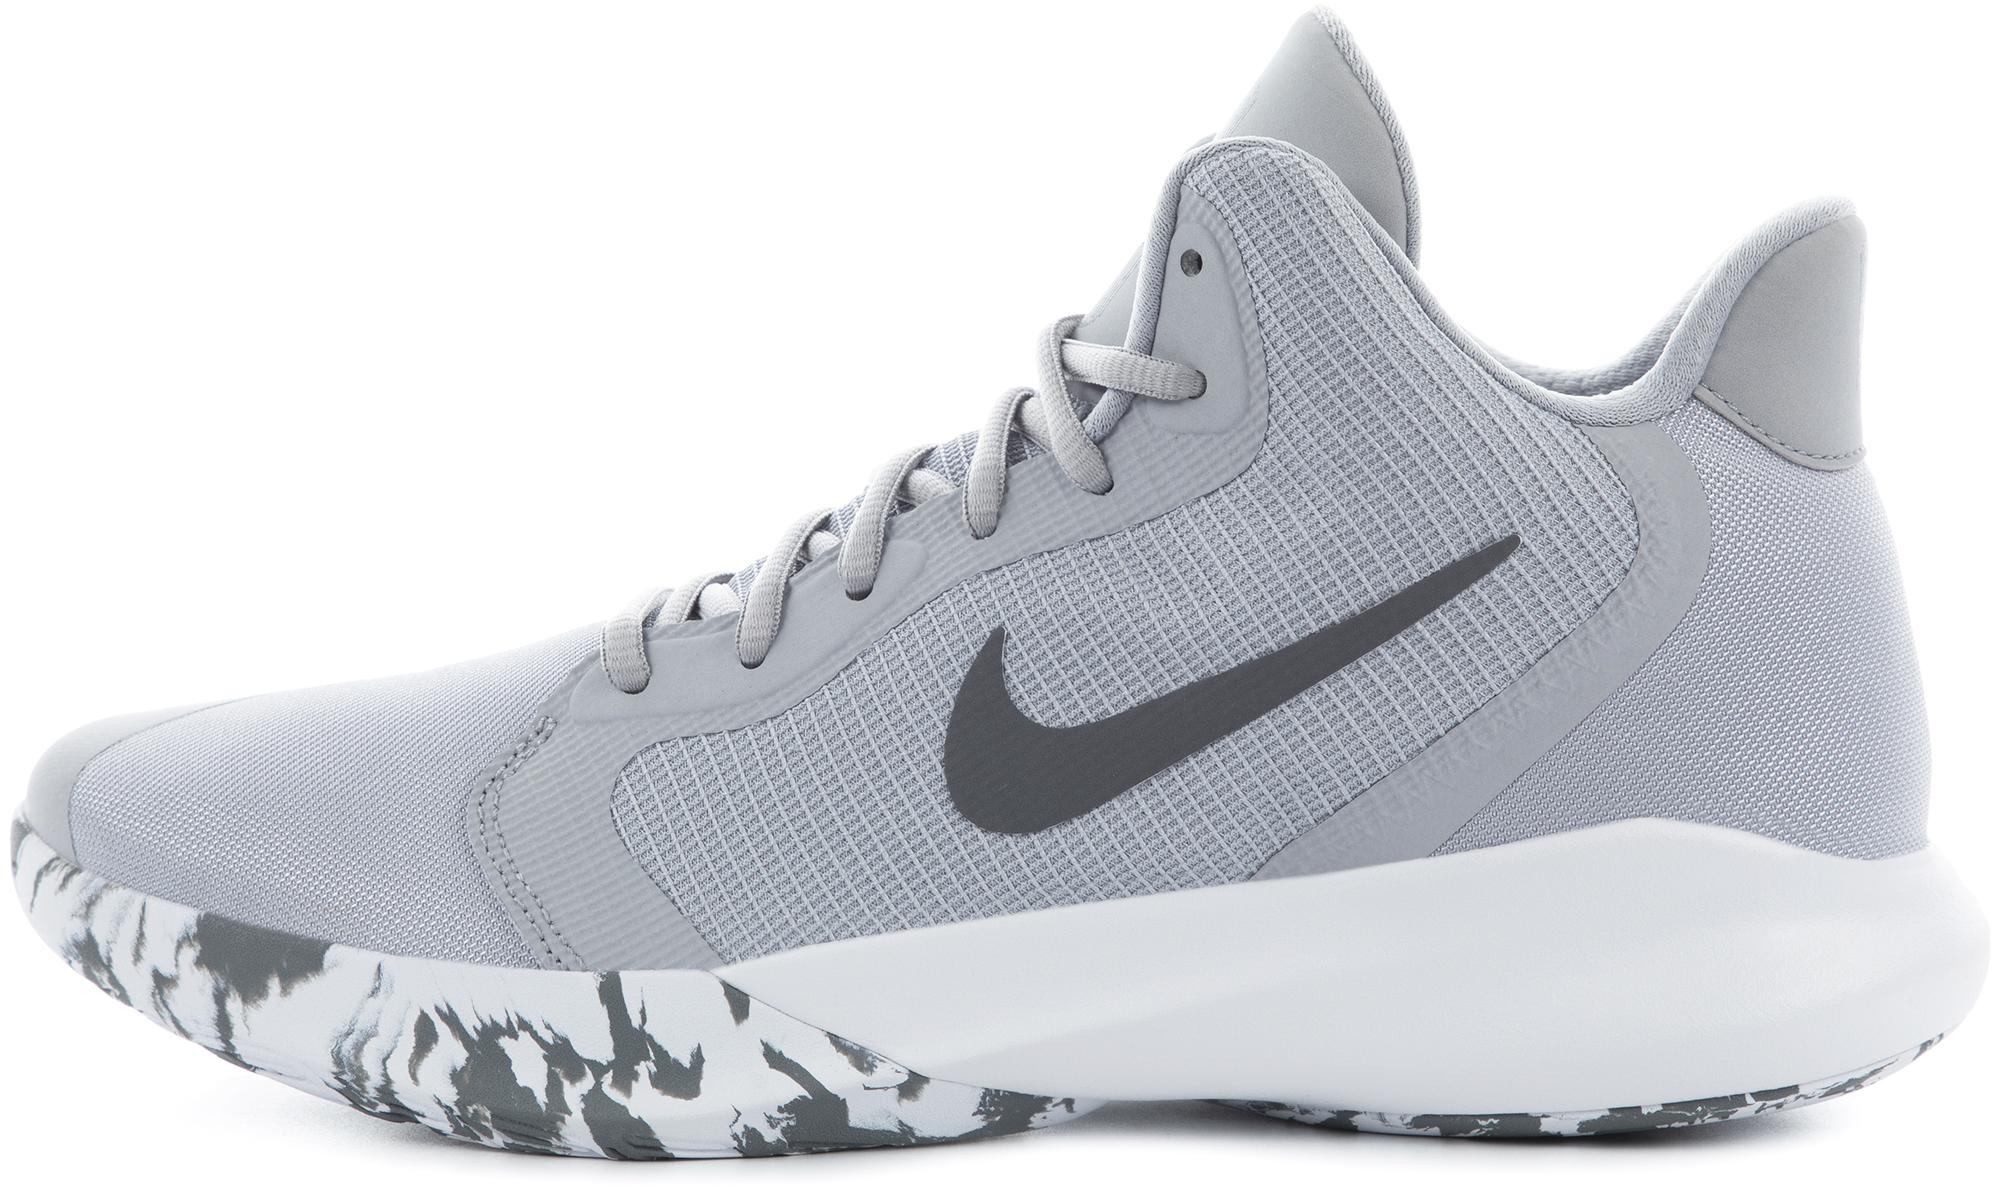 Nike Кроссовки мужские Nike Precision Iii, размер 46,5 цена